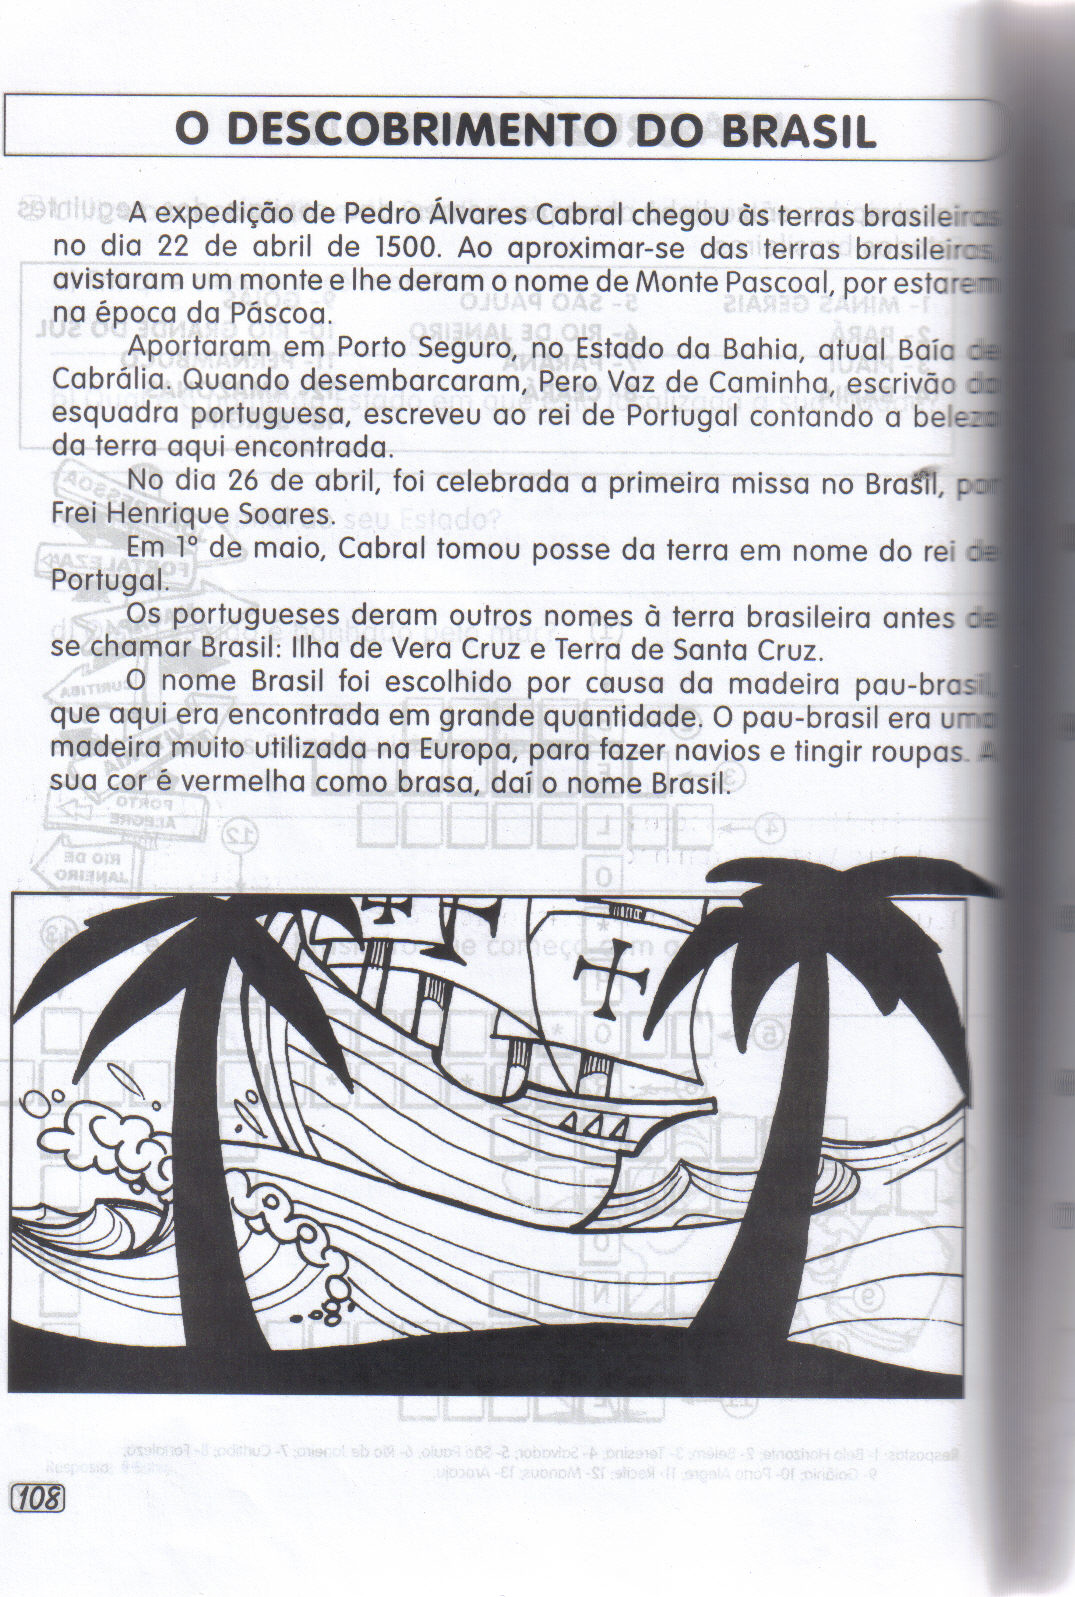 Historia de brasilia yahoo dating 1